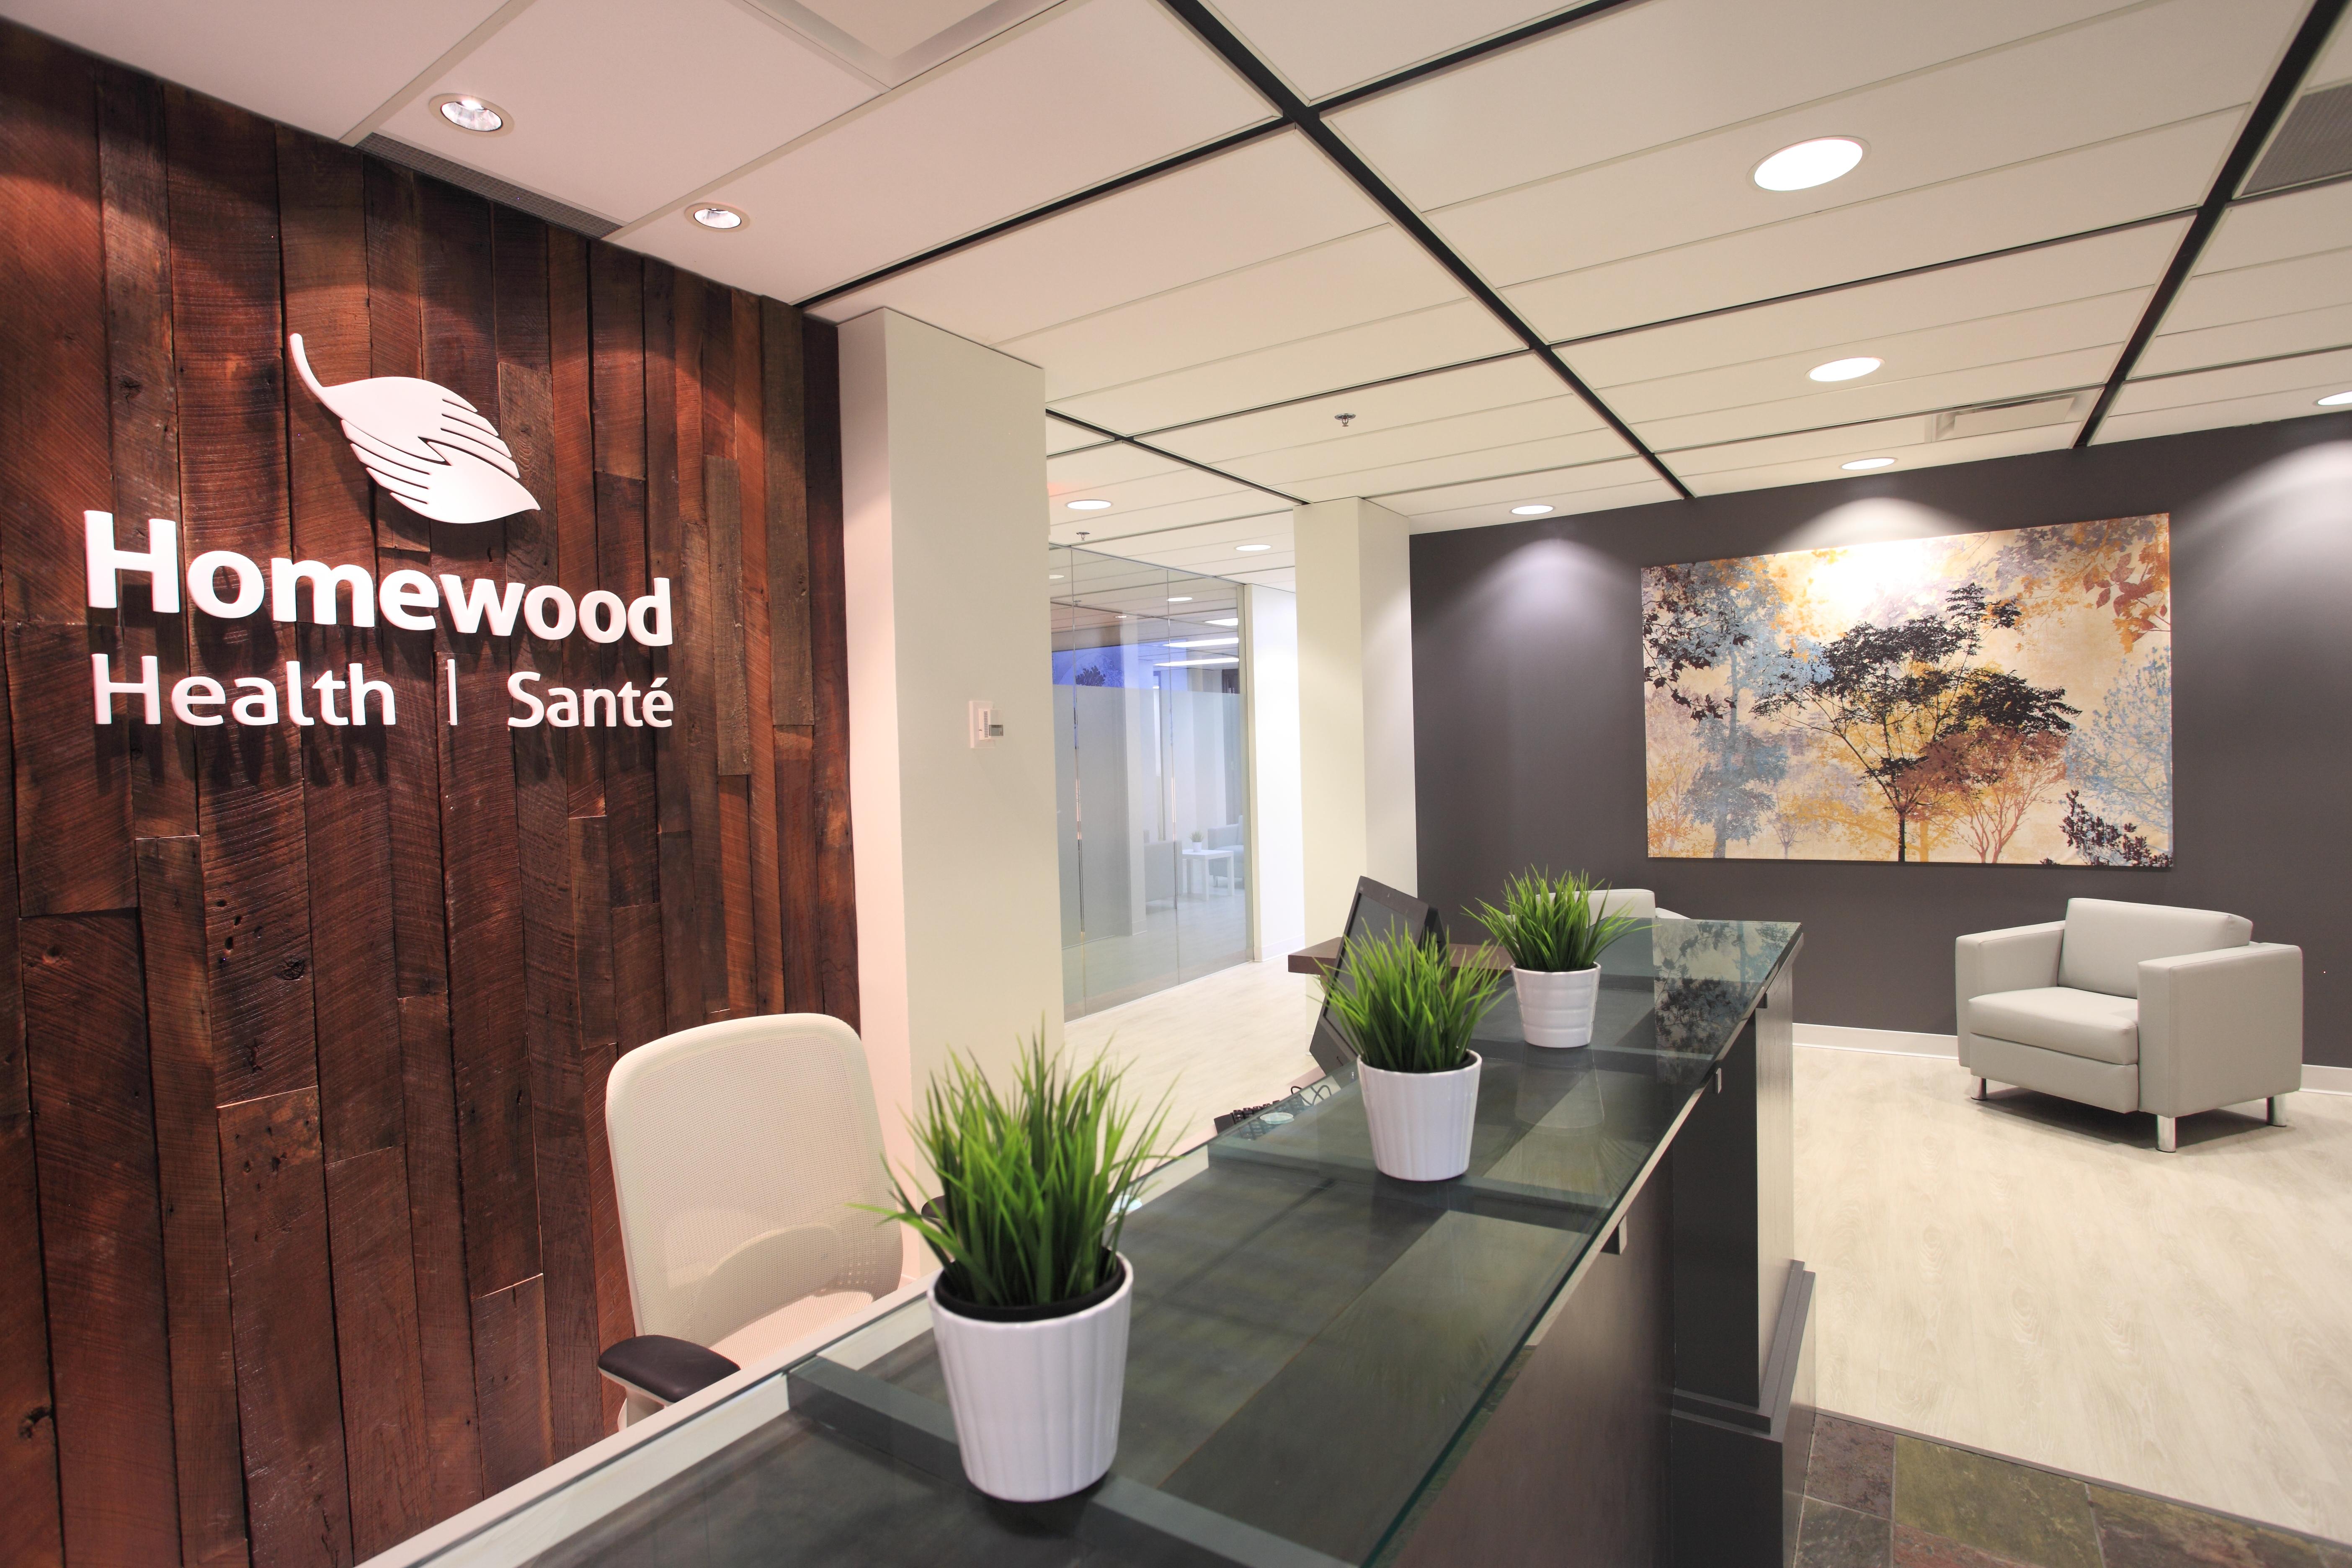 Homewood Health Clinics